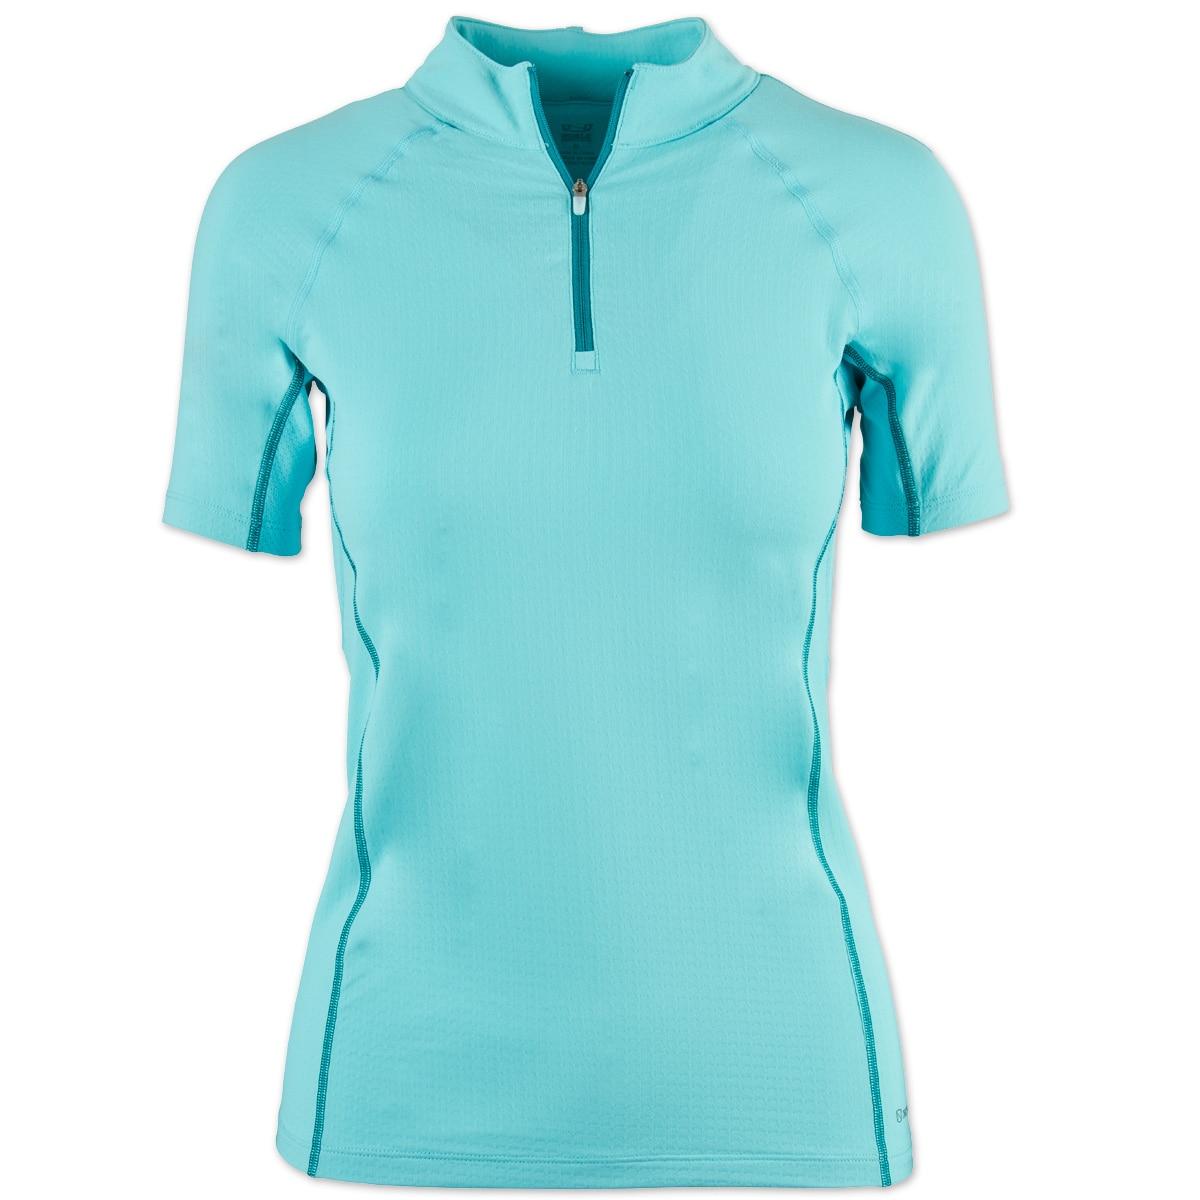 Noble Outfitters Ashley Shortsleeve Performance Shirt